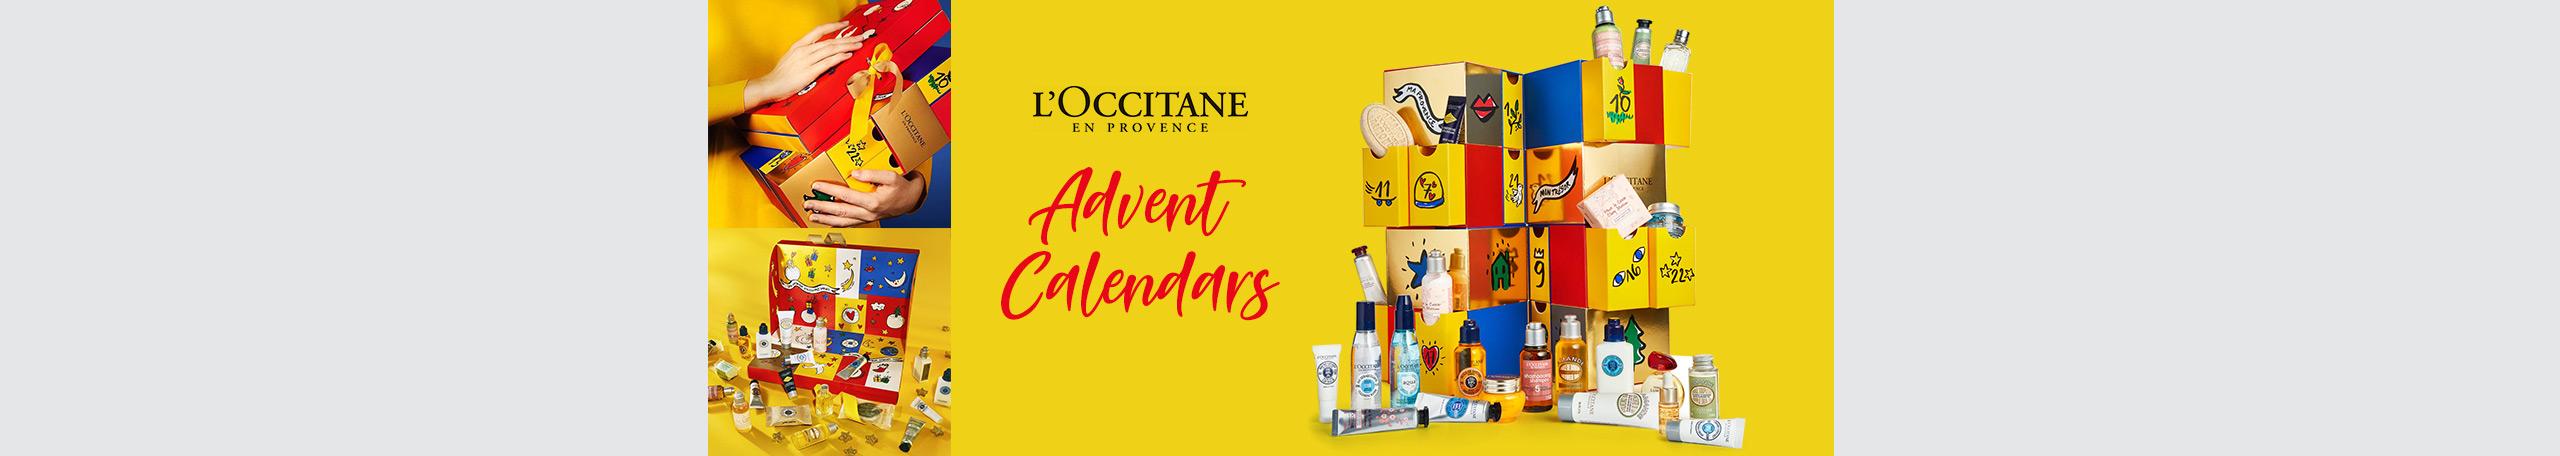 L'Occitane Advent Calendars